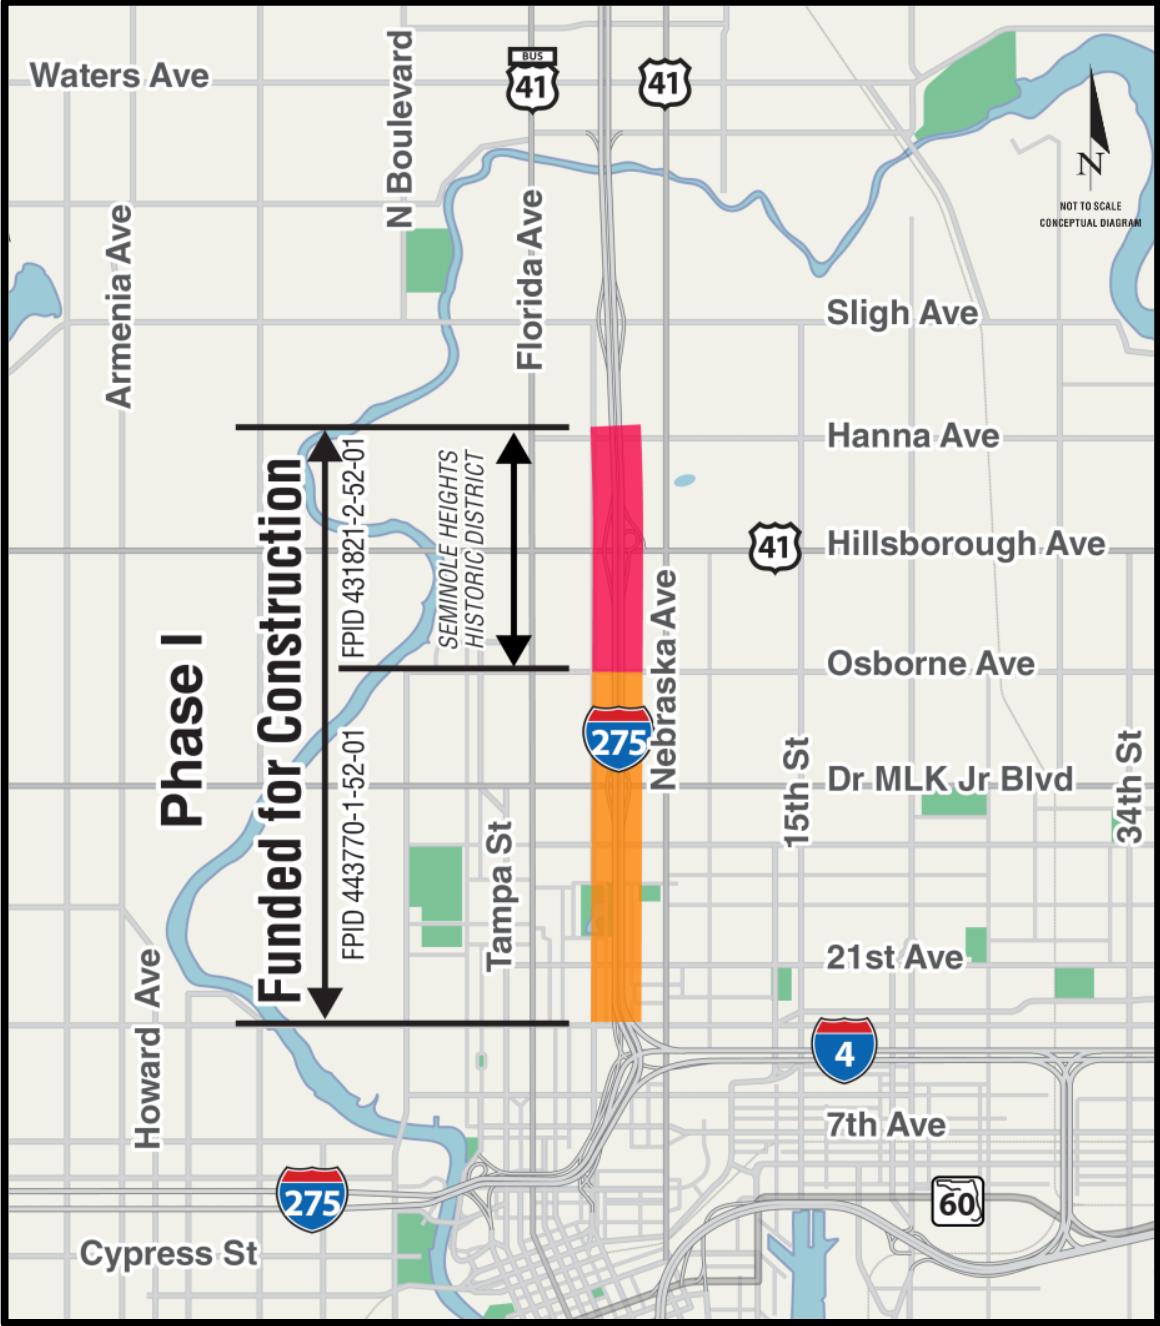 map-fdot-i-4-interchange-tampa-bay-next.png